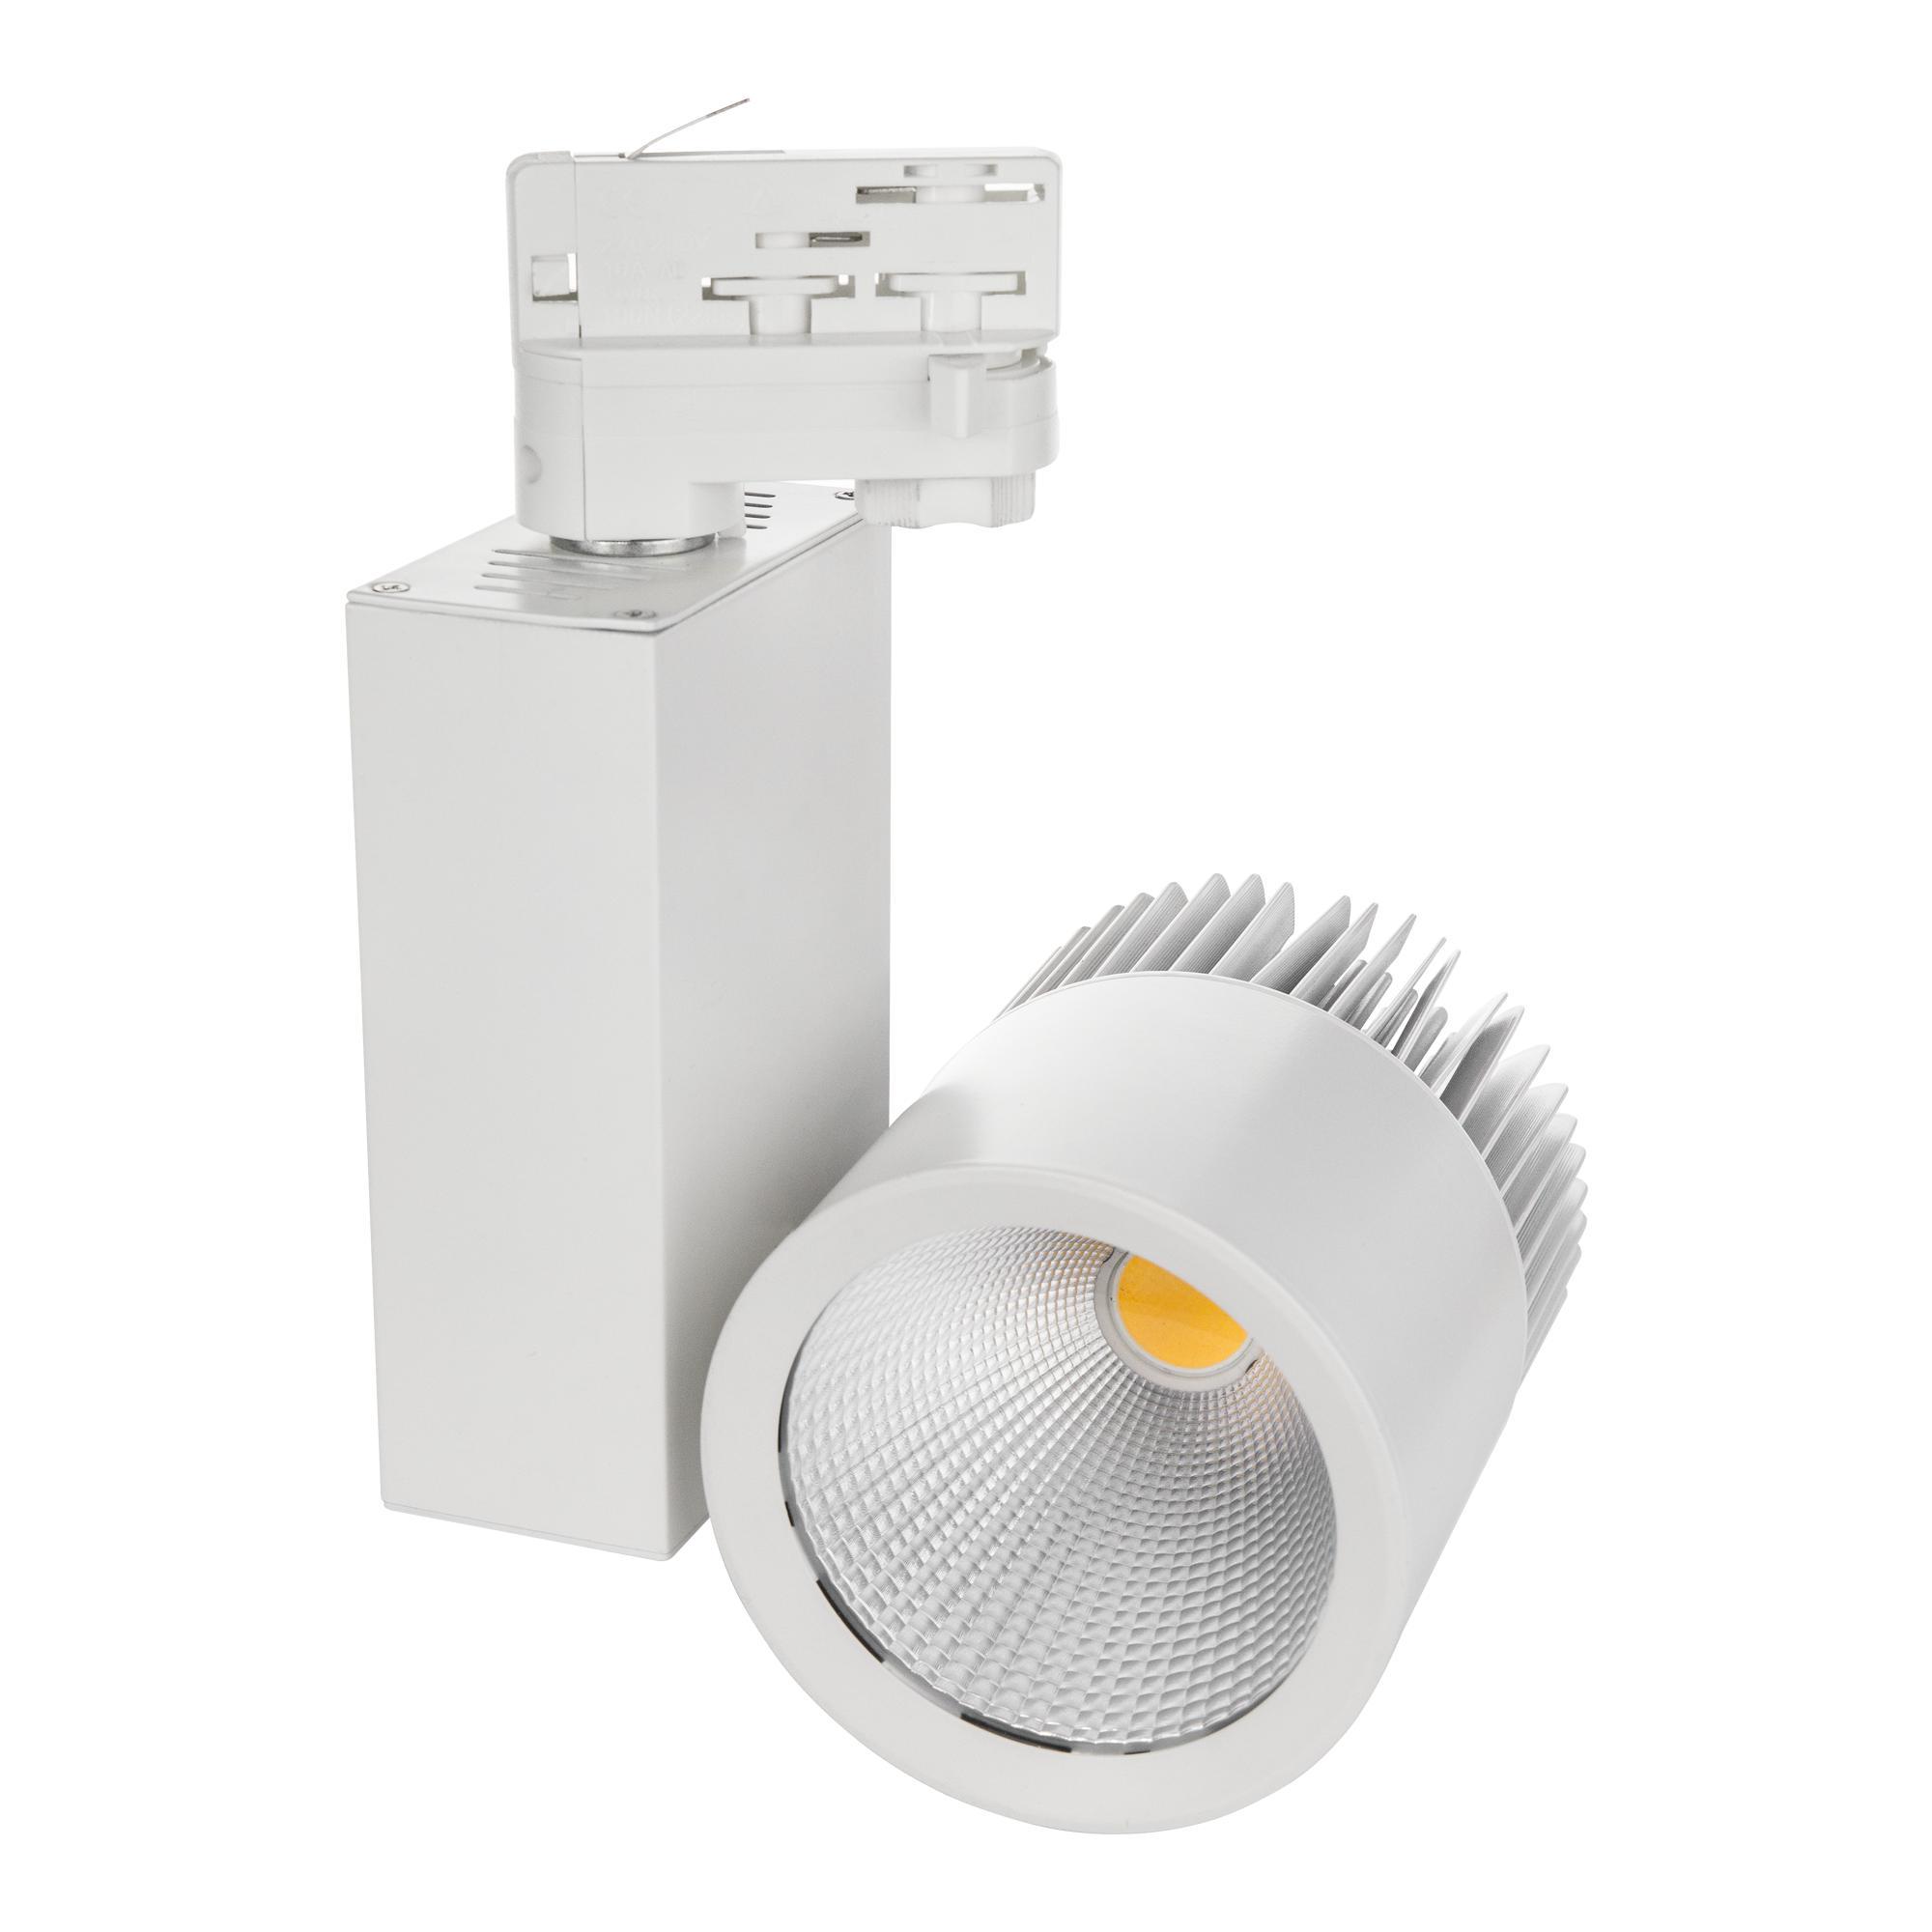 MDR APUS 930 35W 230V 36ST WHITE